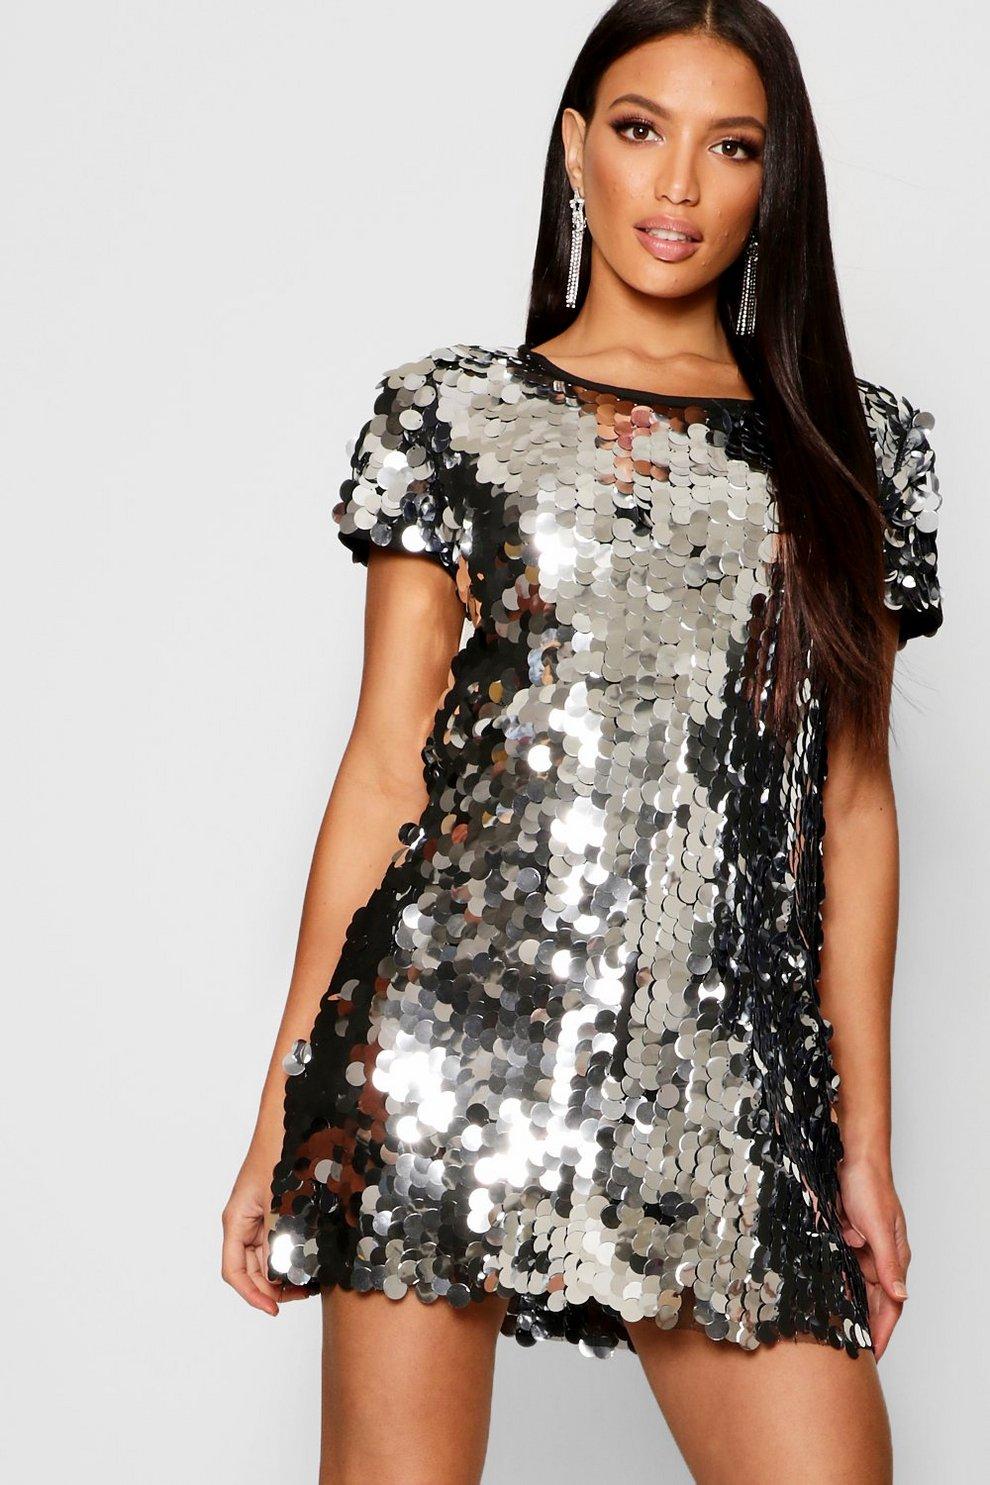 Boohoo Plus Sequin Disk Shift Dress Sale Cheap Prices wPijP49UXu